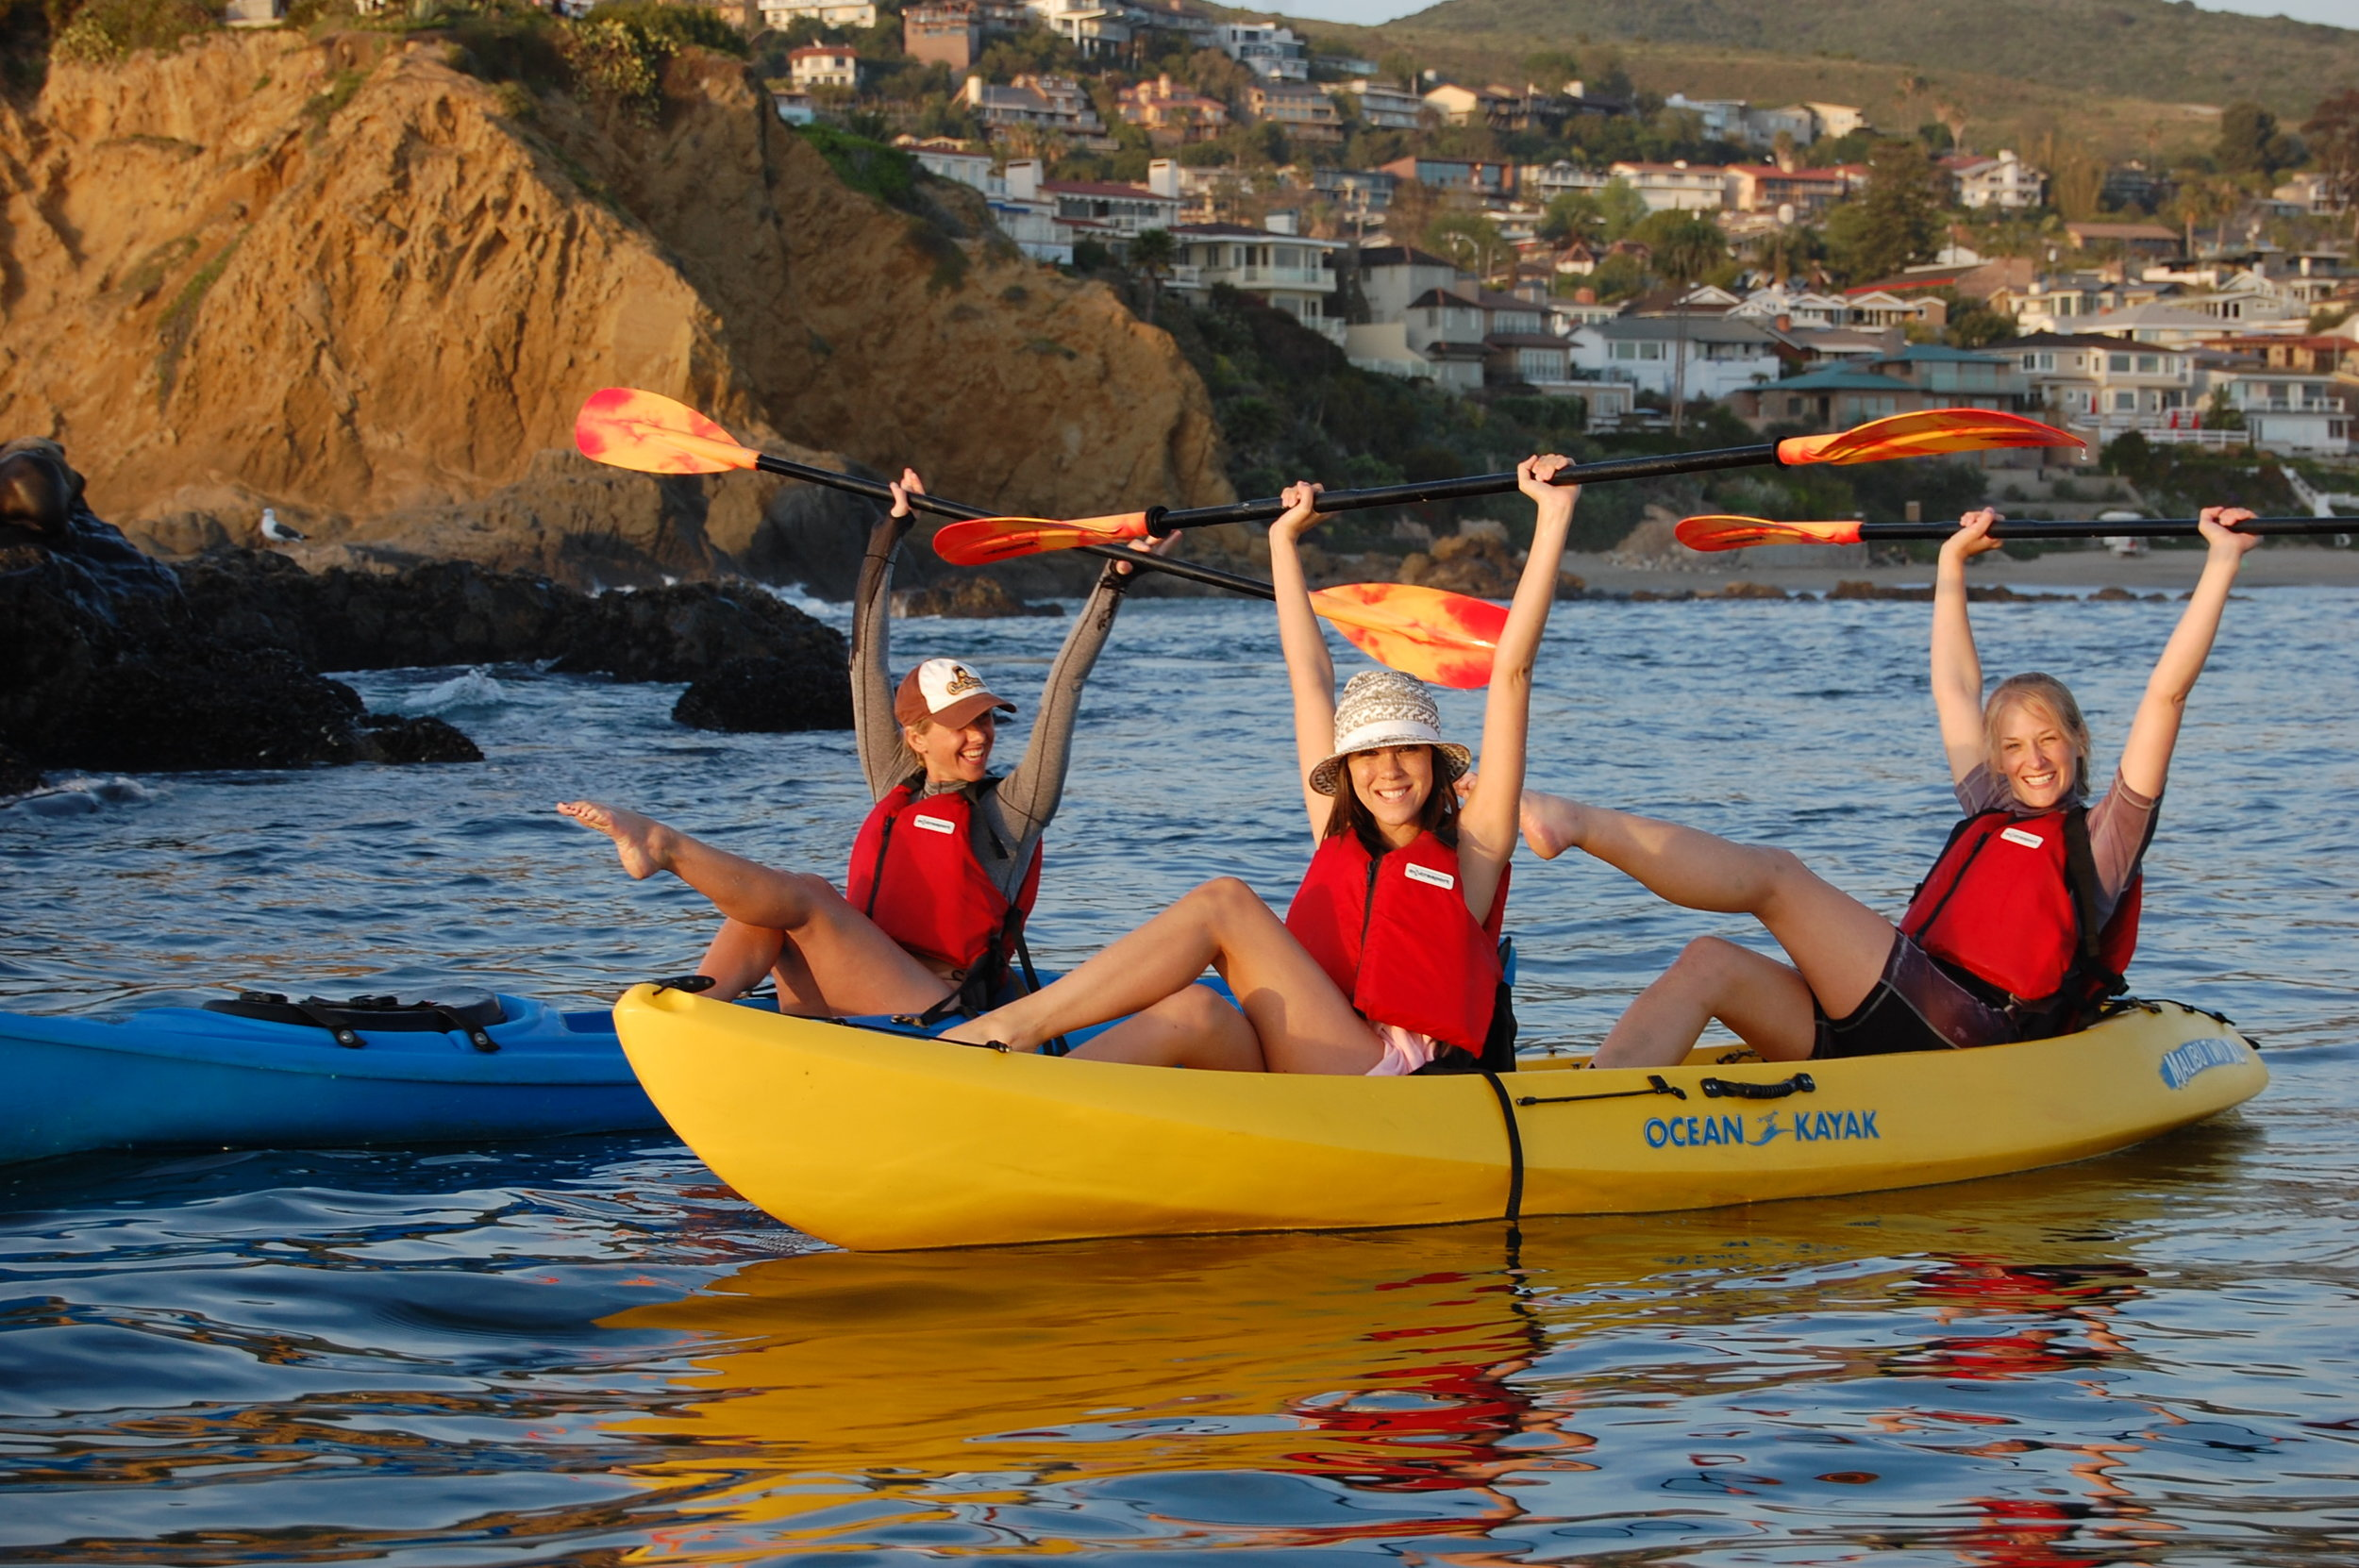 KayakTours -